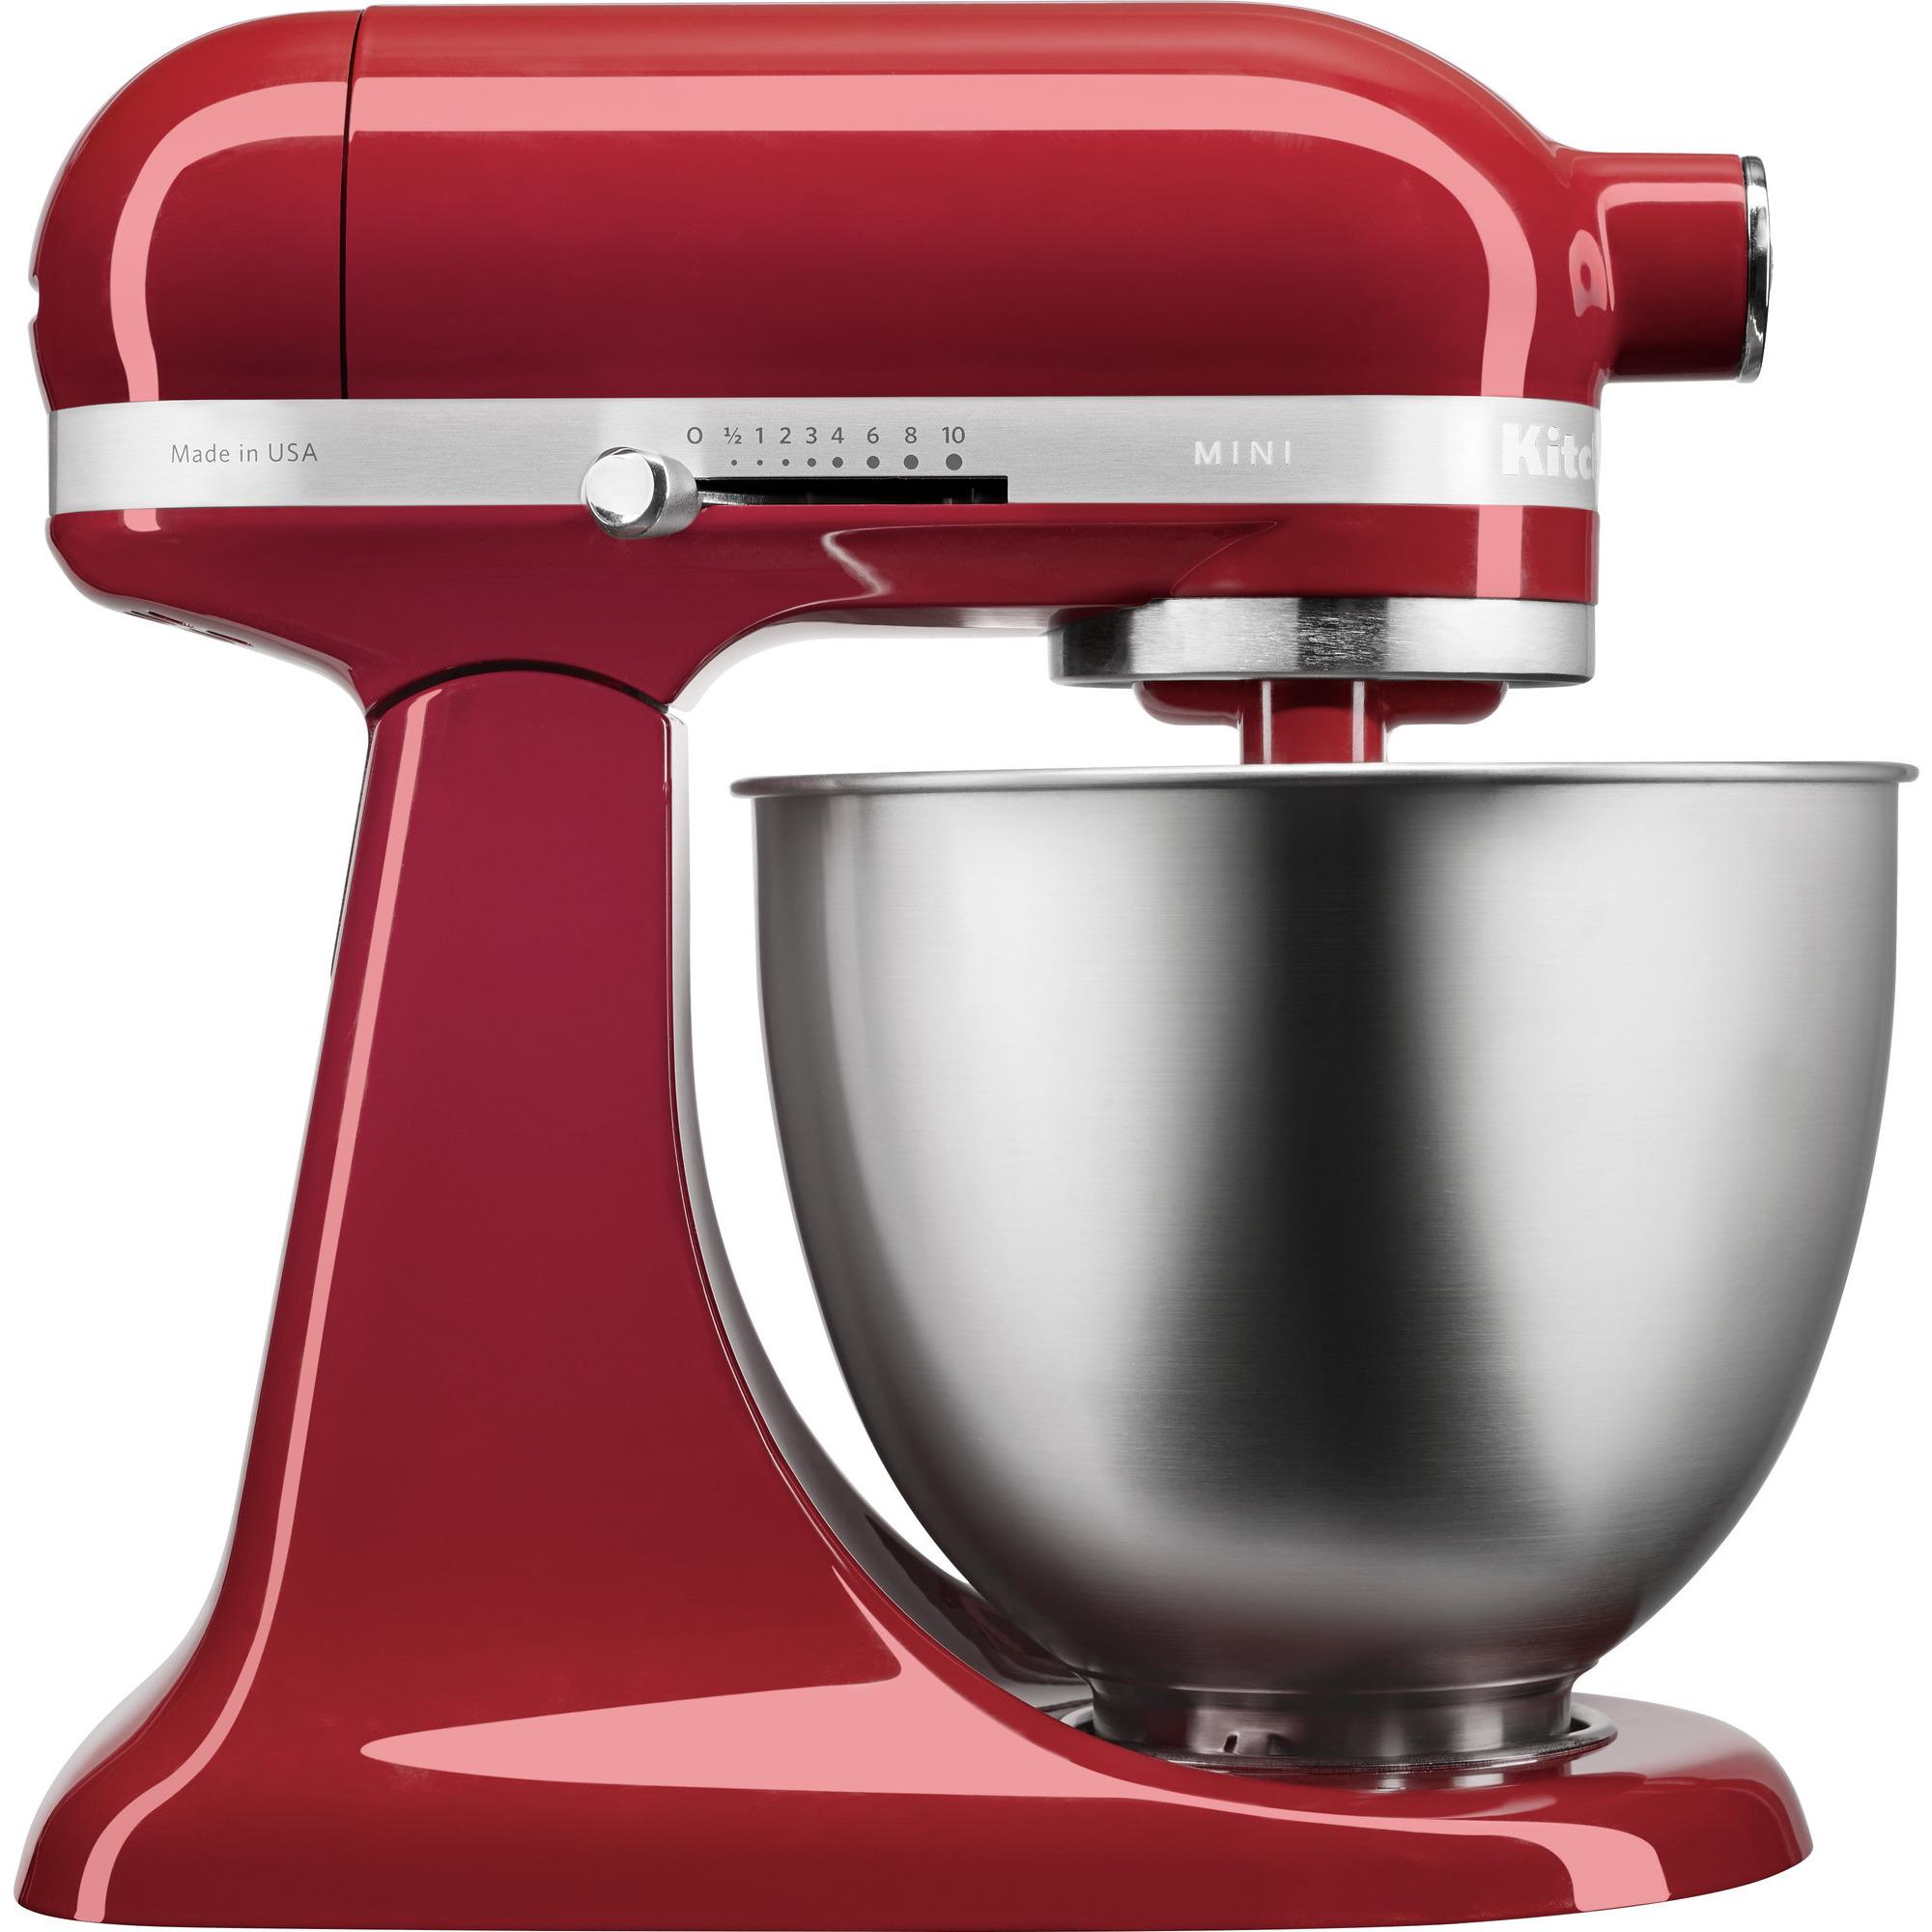 KitchenAid Artisan Stand Mixer Mini 33 L Red Emperor